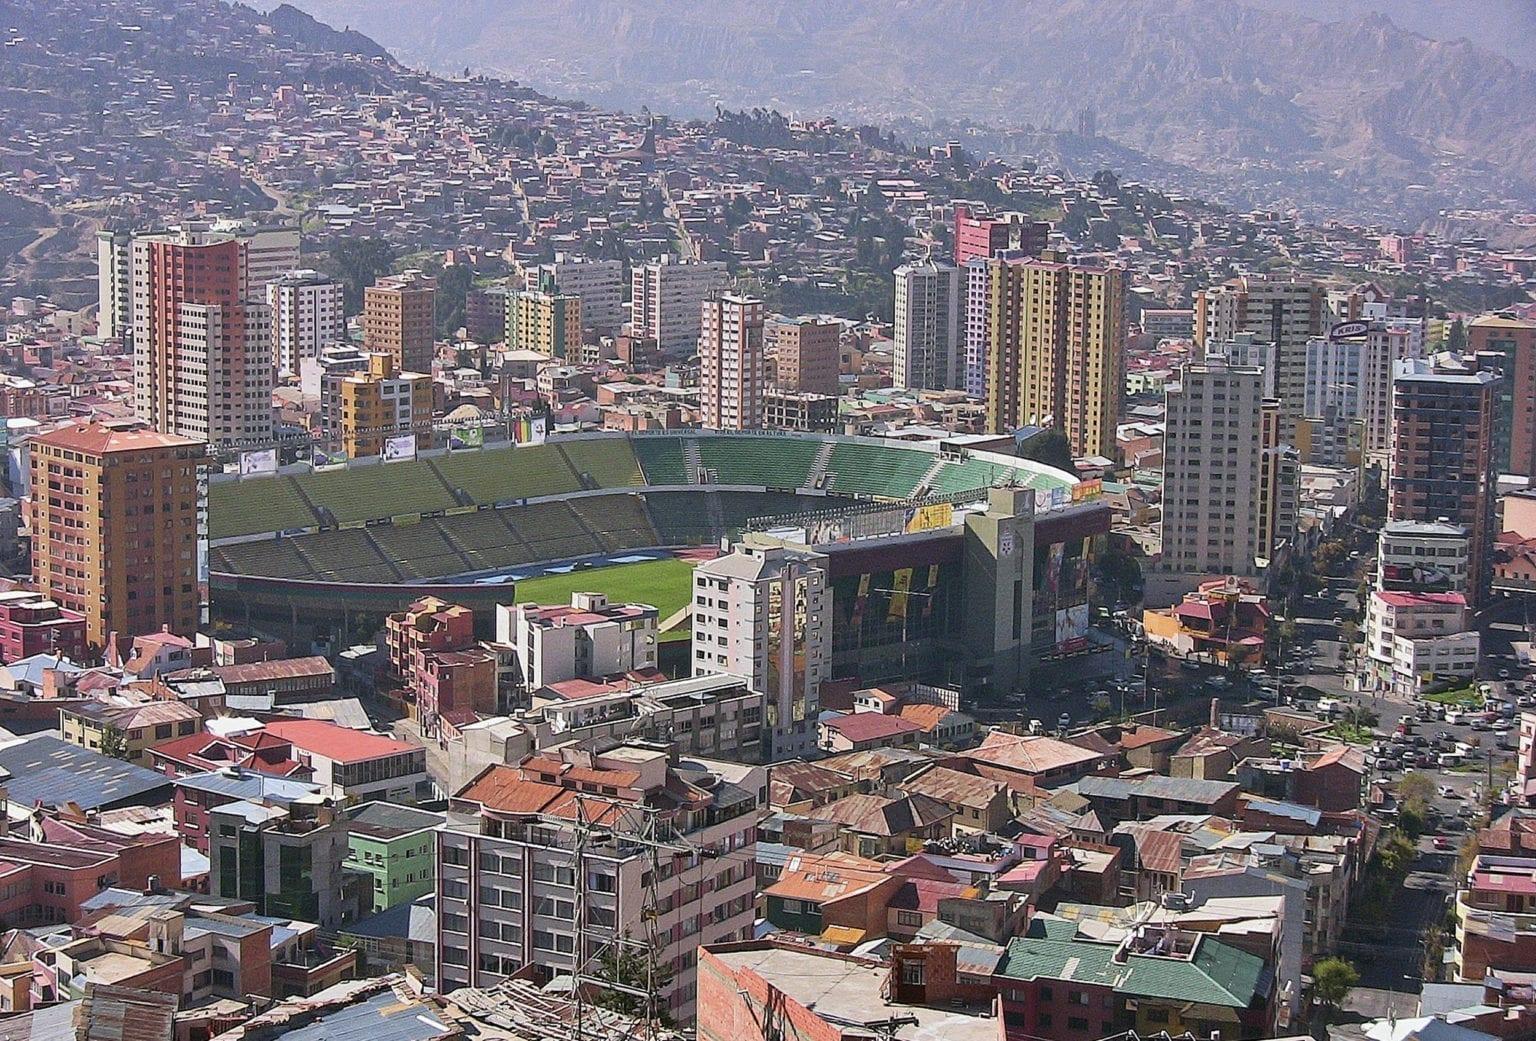 LaPaz_Stadion_Bolivien_Historisch_01_Hell_rgb_M-1536x1041-1-1